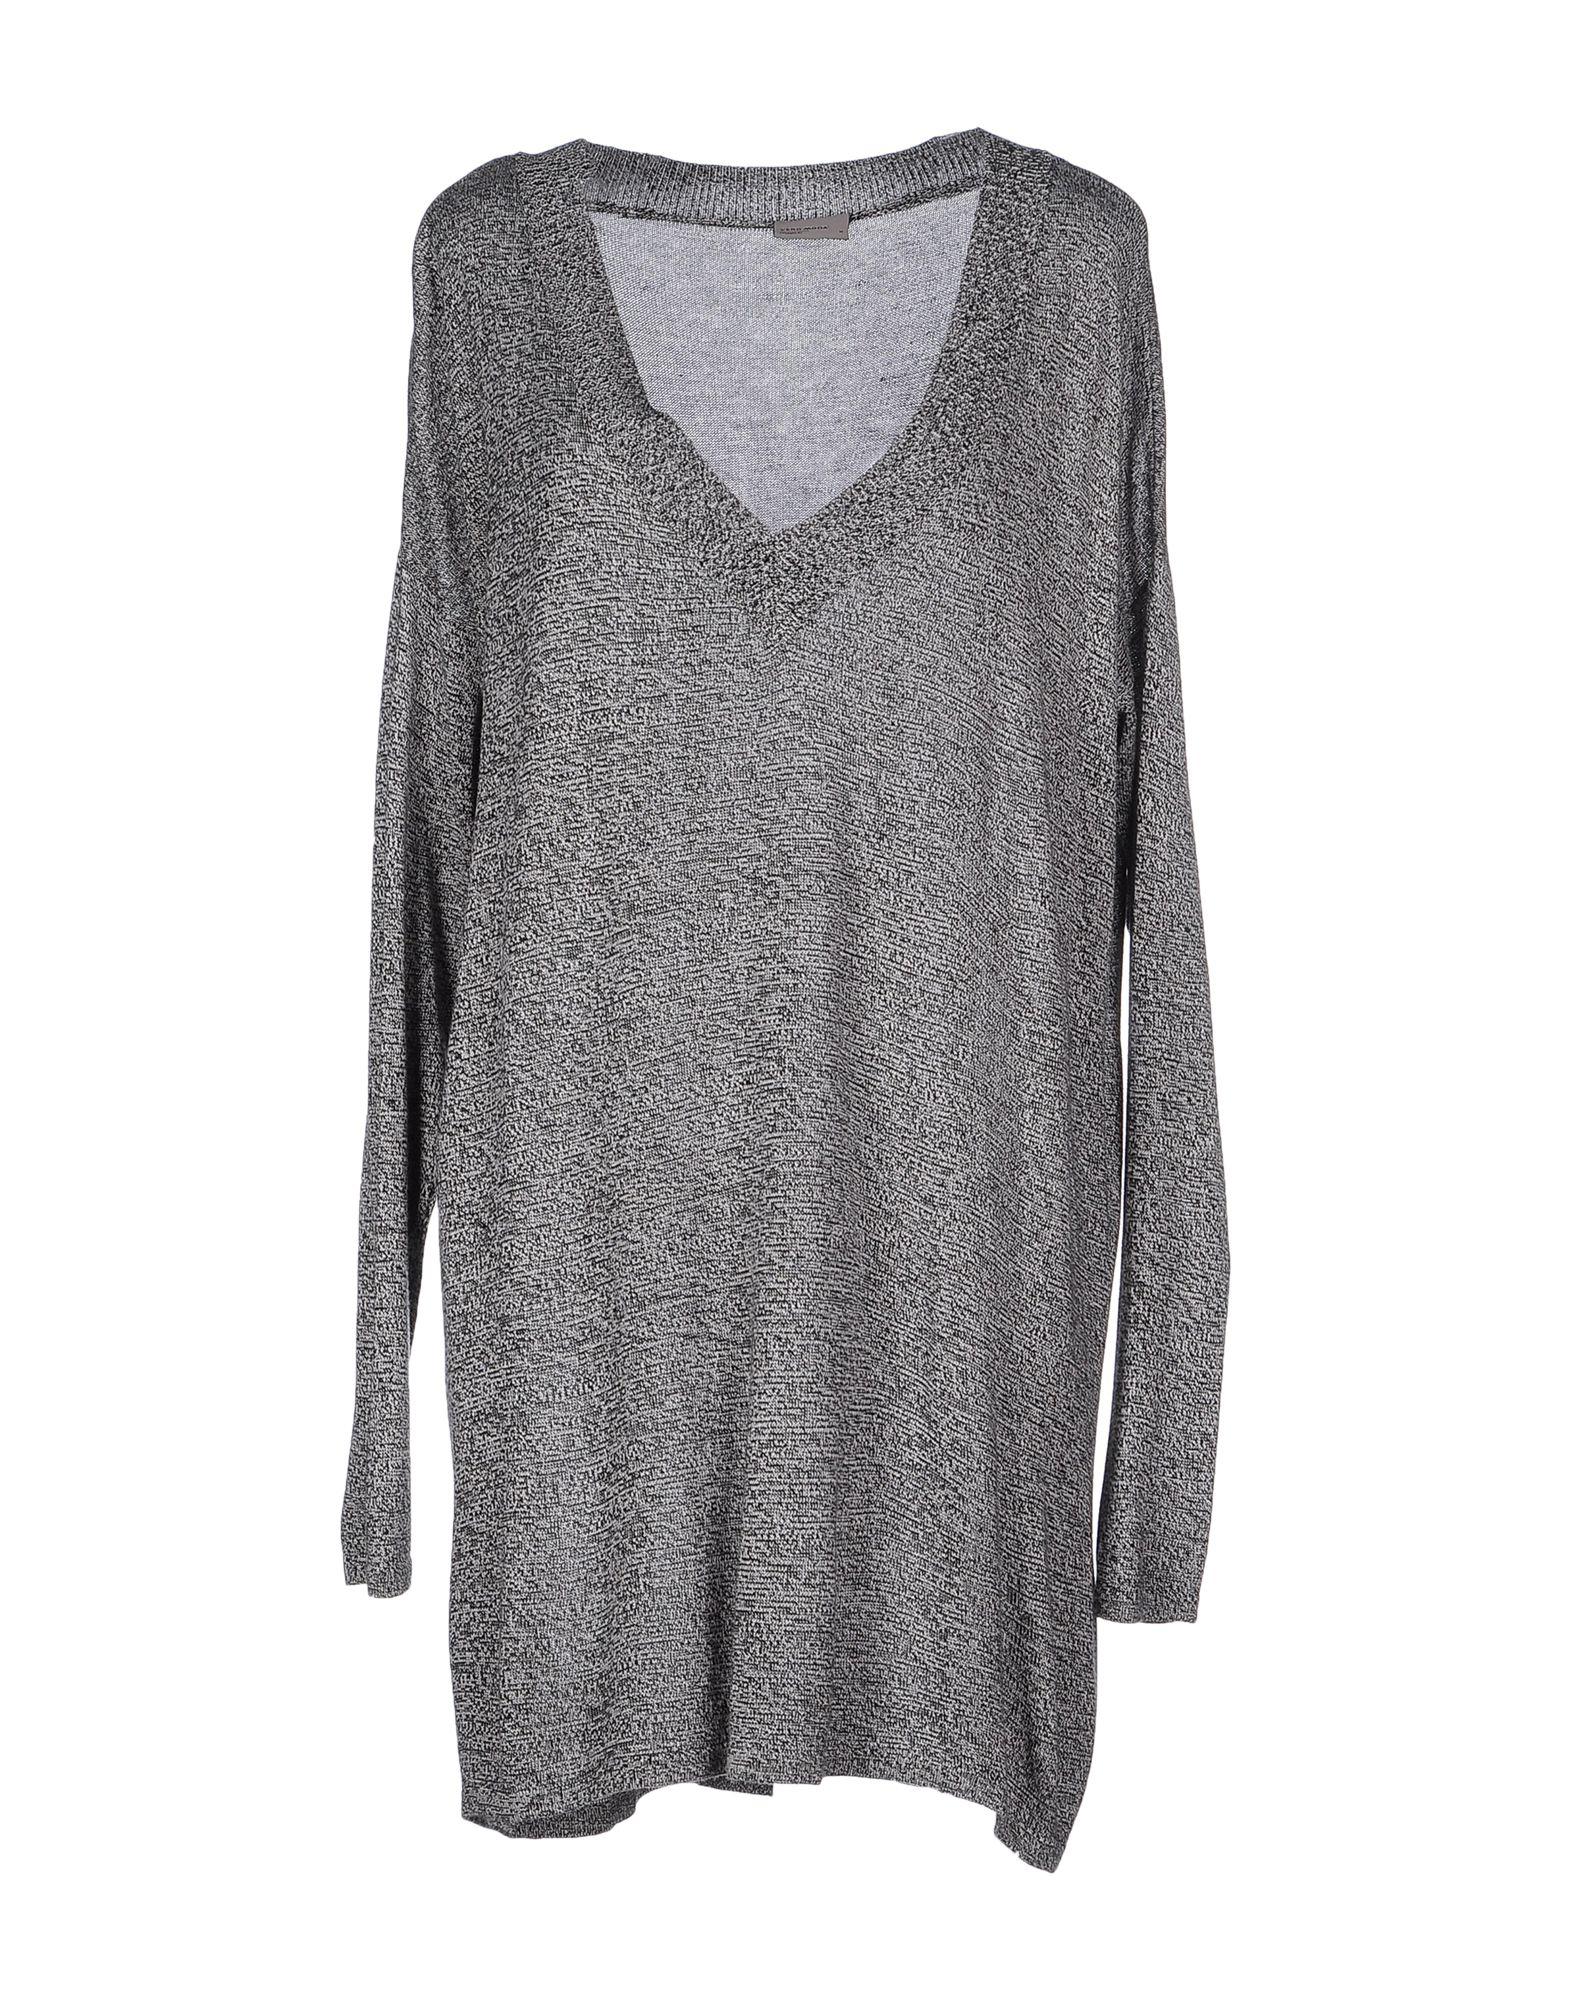 Vero Moda Knitting Patterns : Lyst vero moda sweater in black